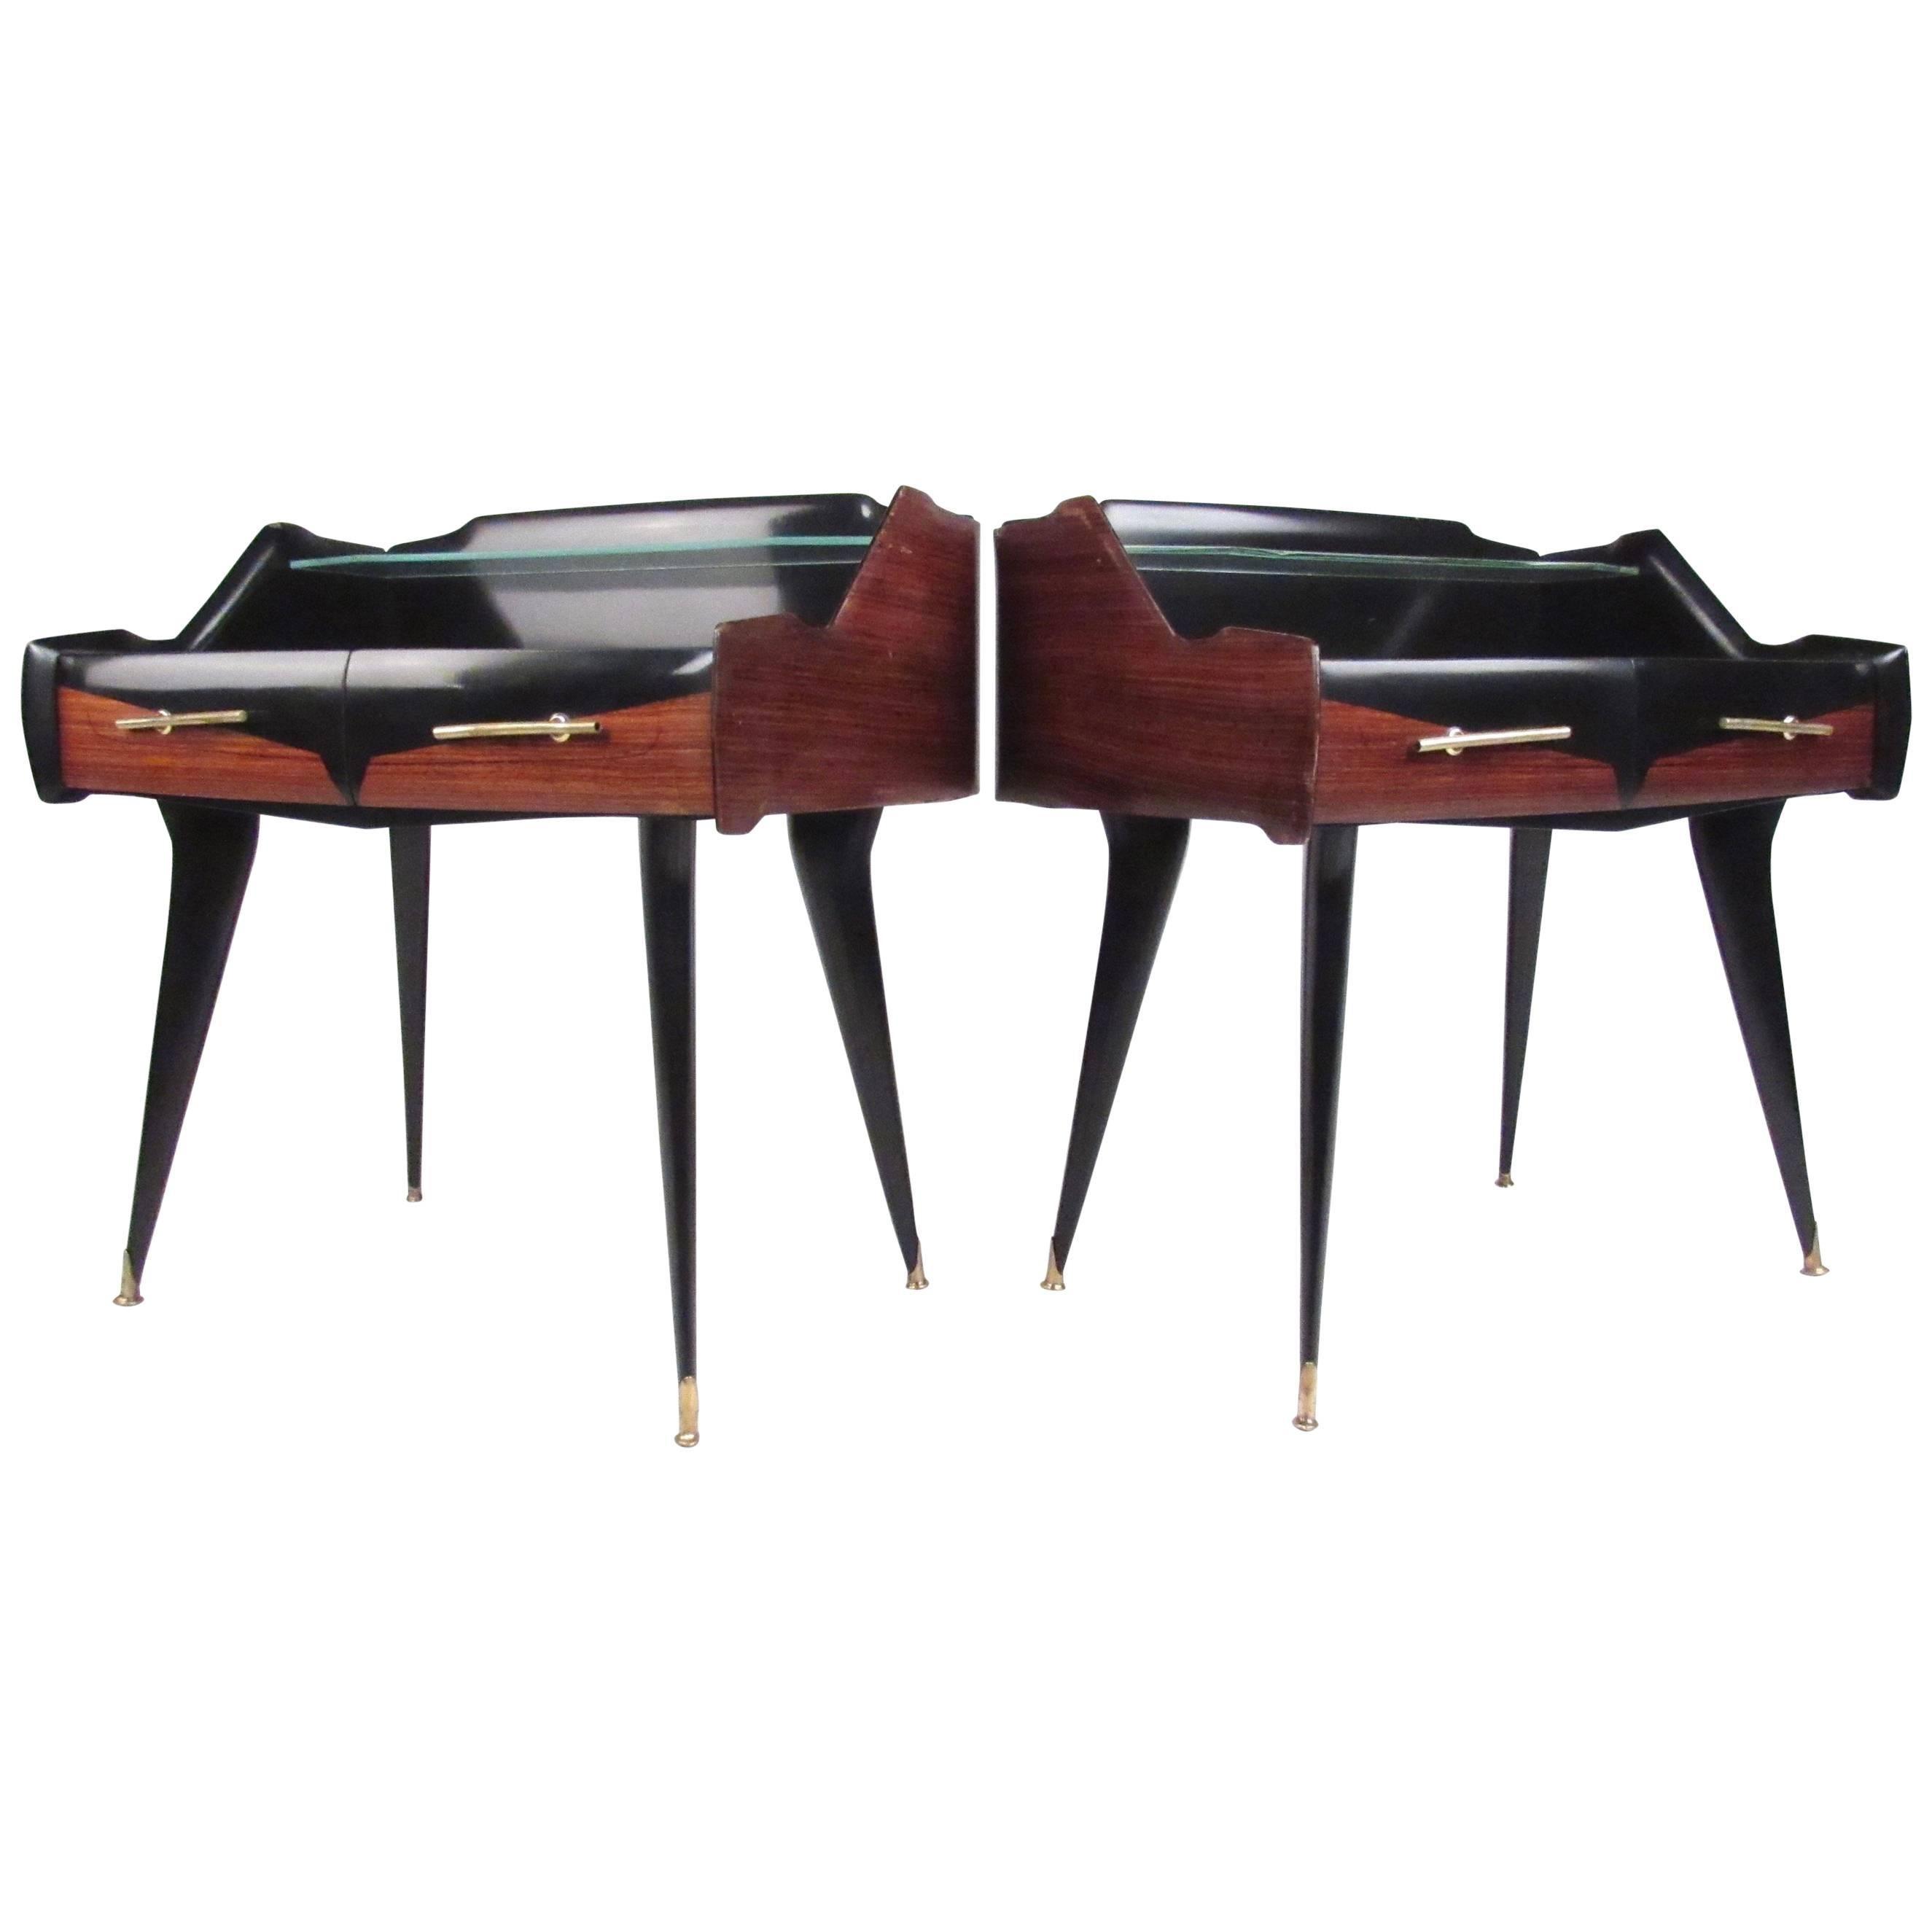 Pair Italian Modern End Tables by Paolo Buffa